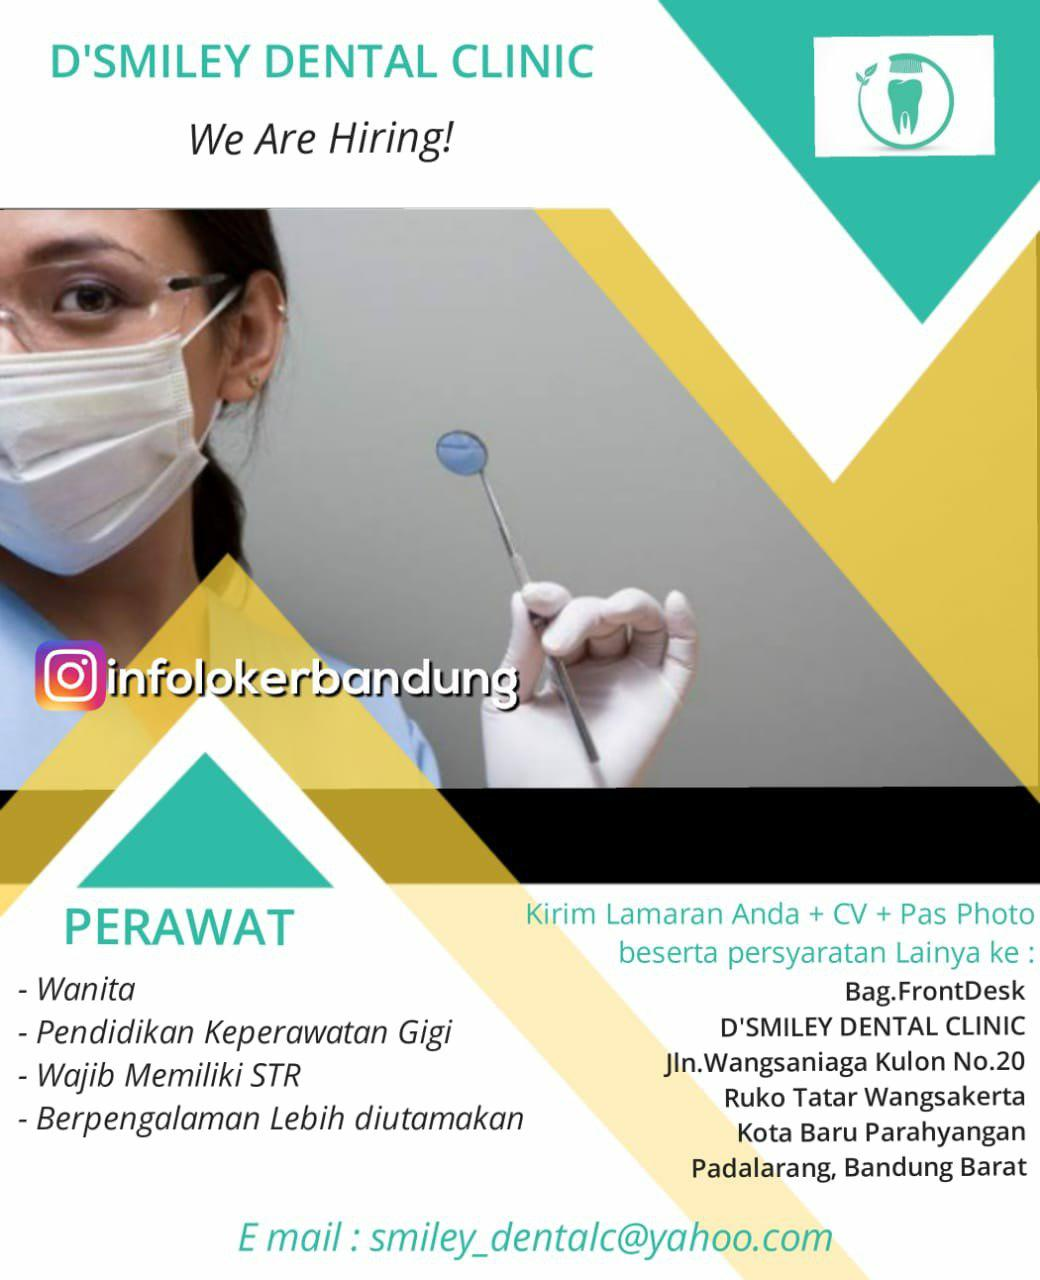 Lowongan Kerja Sebagai Perawat D'Smiley Dental Clinic Bandung Mei 2018